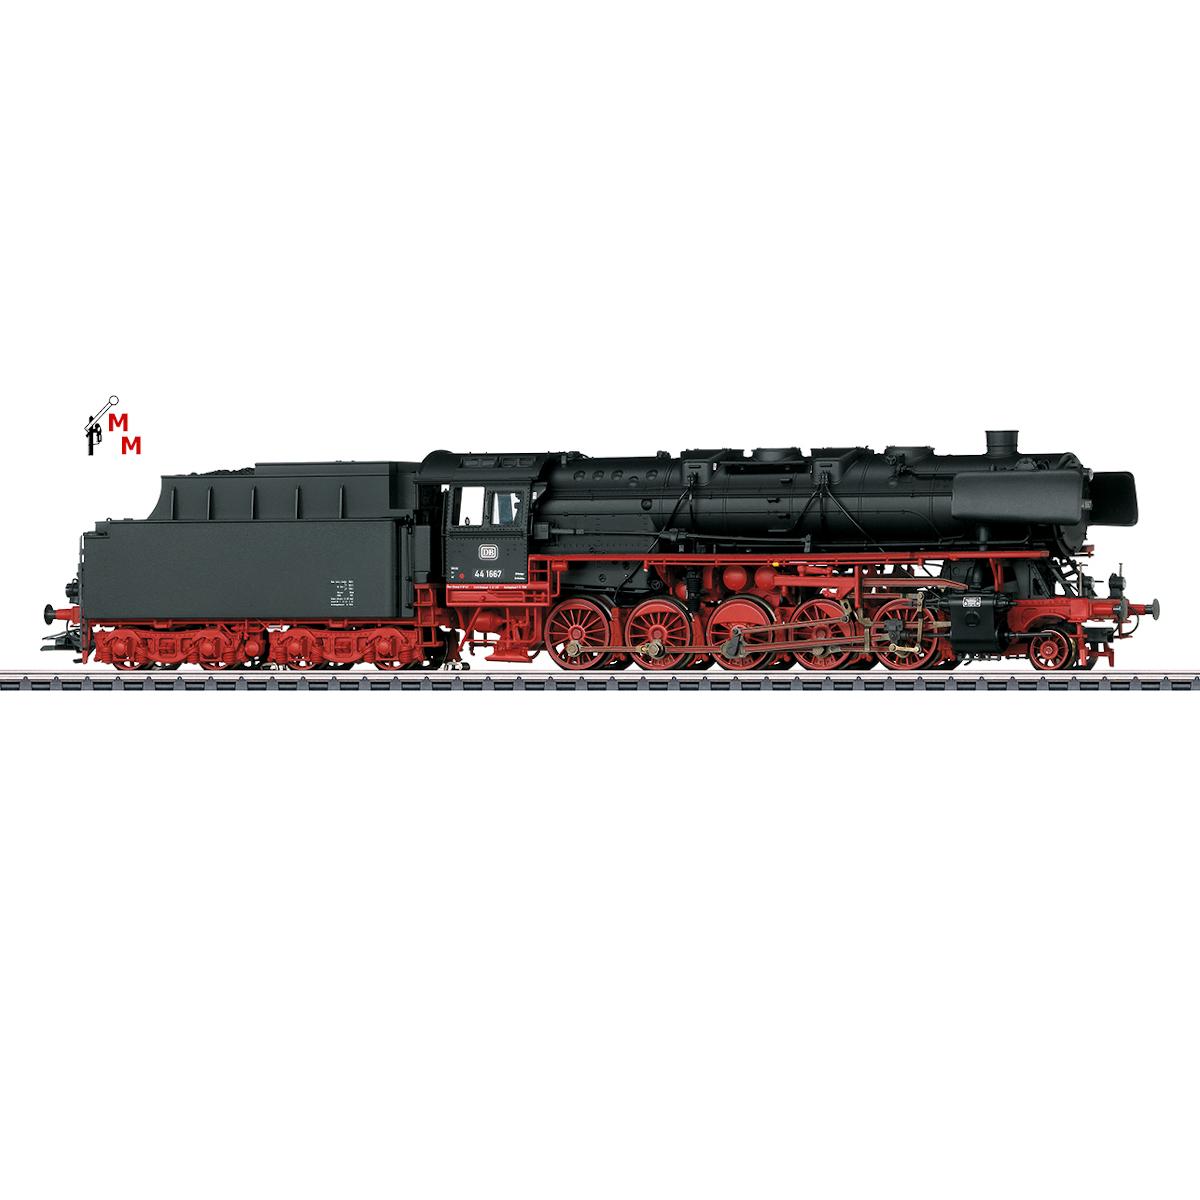 (Neu) Märklin 39883 Dampflok BR 44 mit Kohle-Tender, DB, Ep.III, ohne Sound,